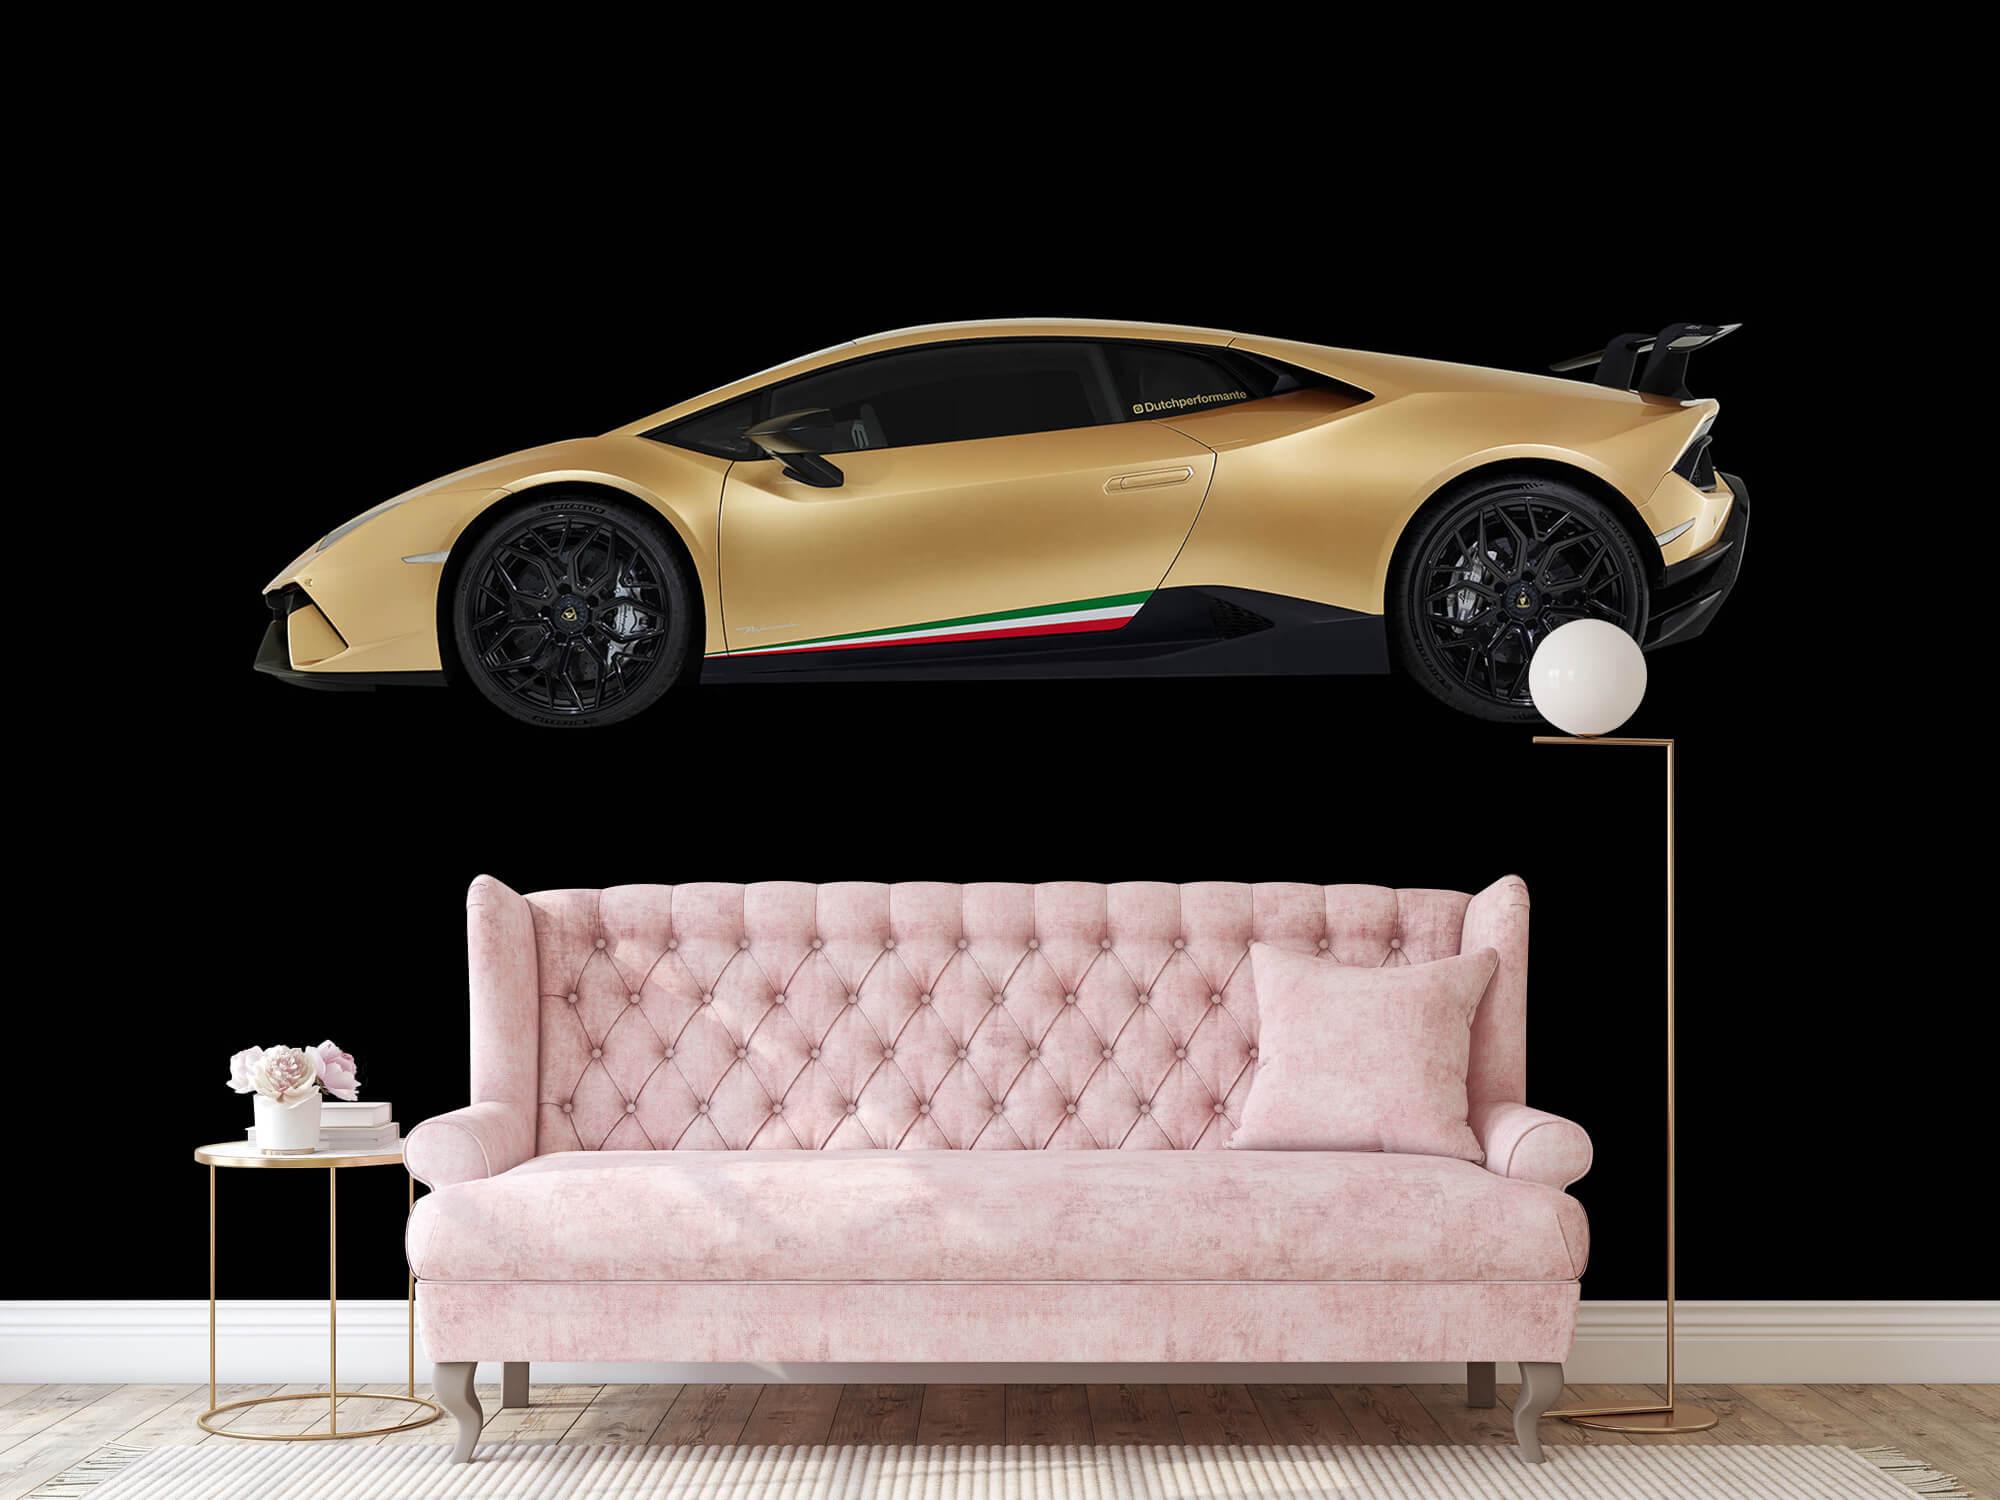 Wallpaper Lamborghini Huracán - Côté, noir 14